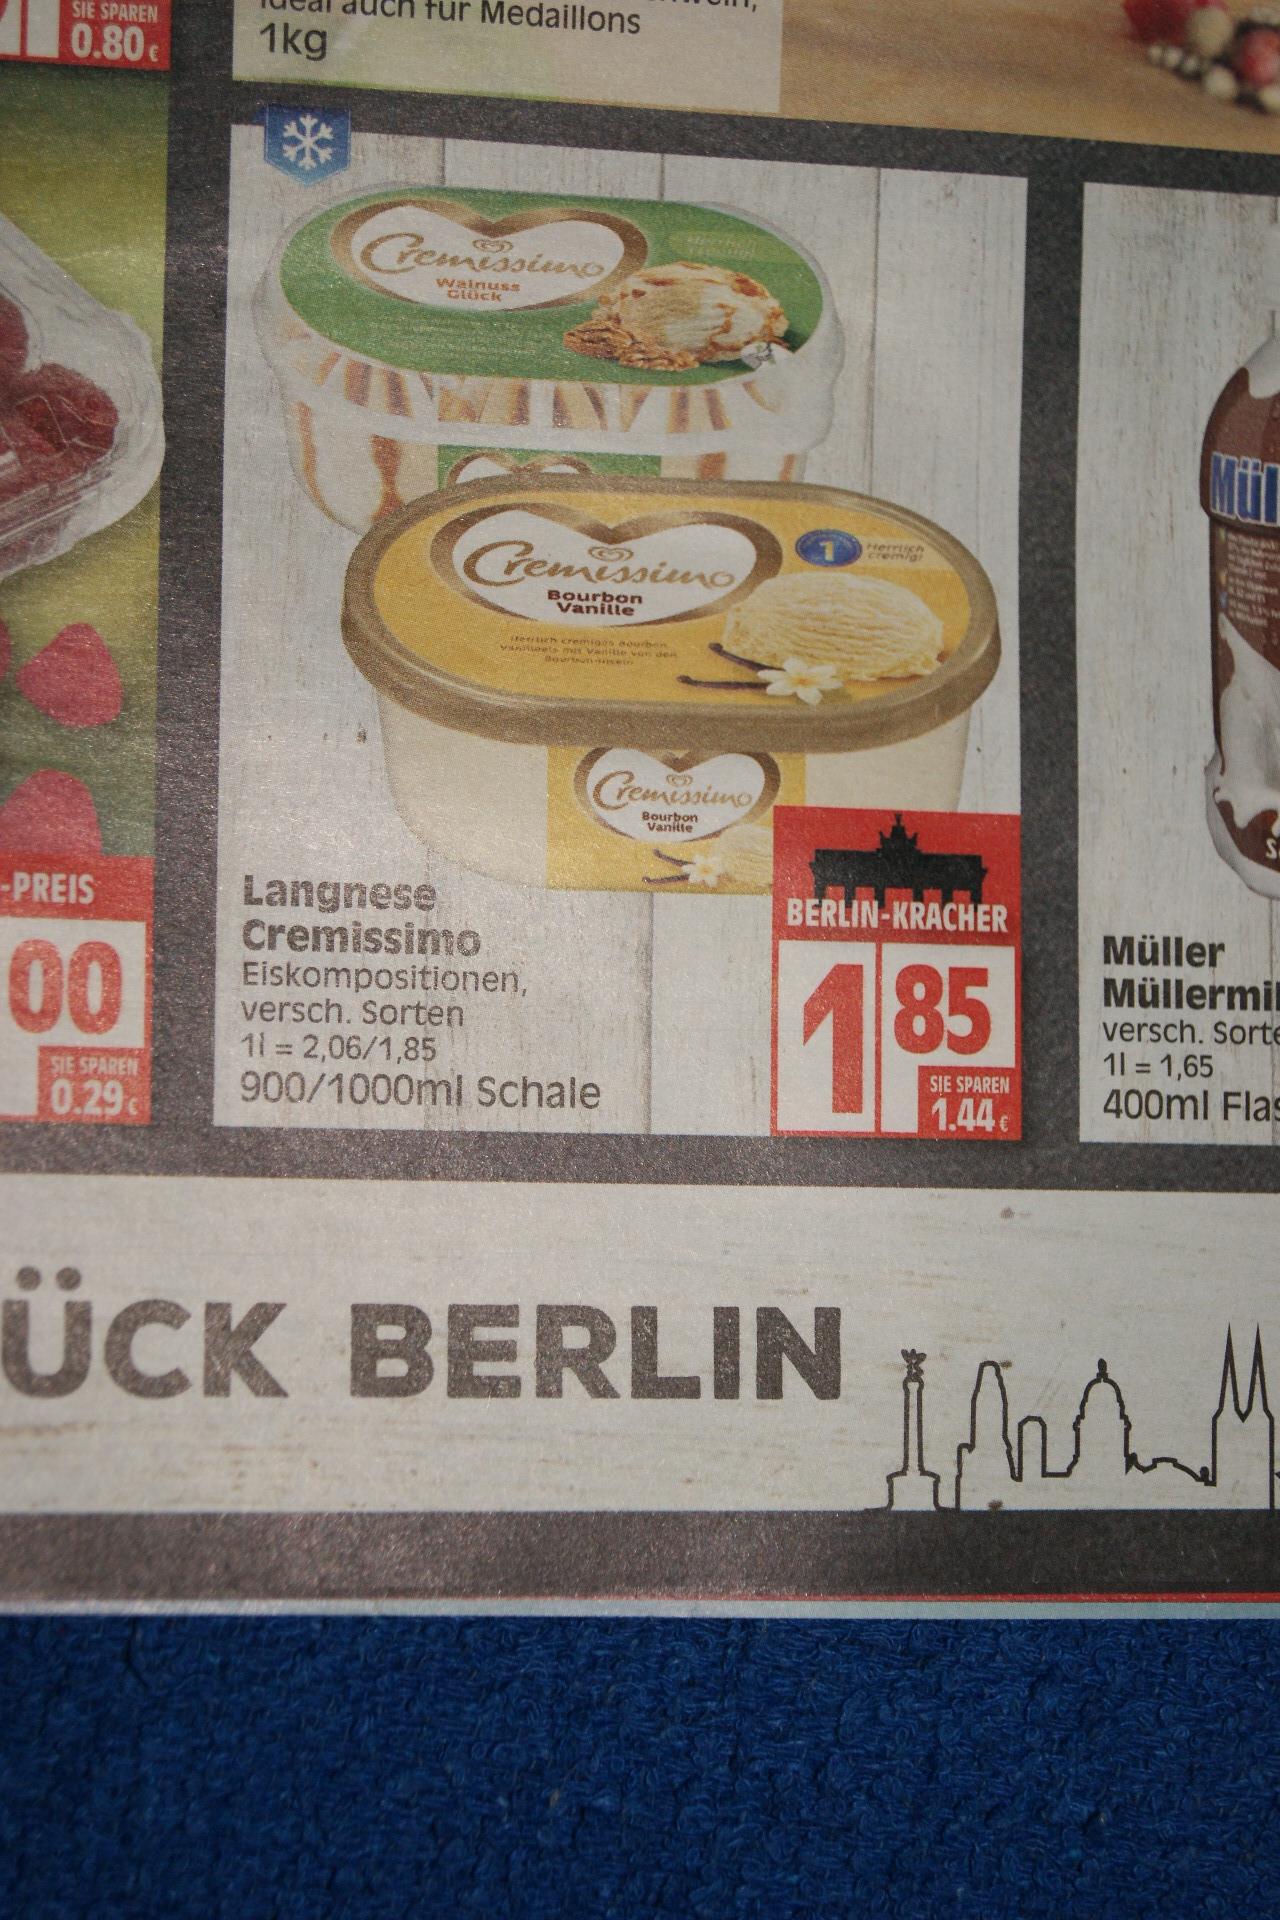 (lokal Berlin) Langnese Cremissimo bei Edeka für 1,85 Euro